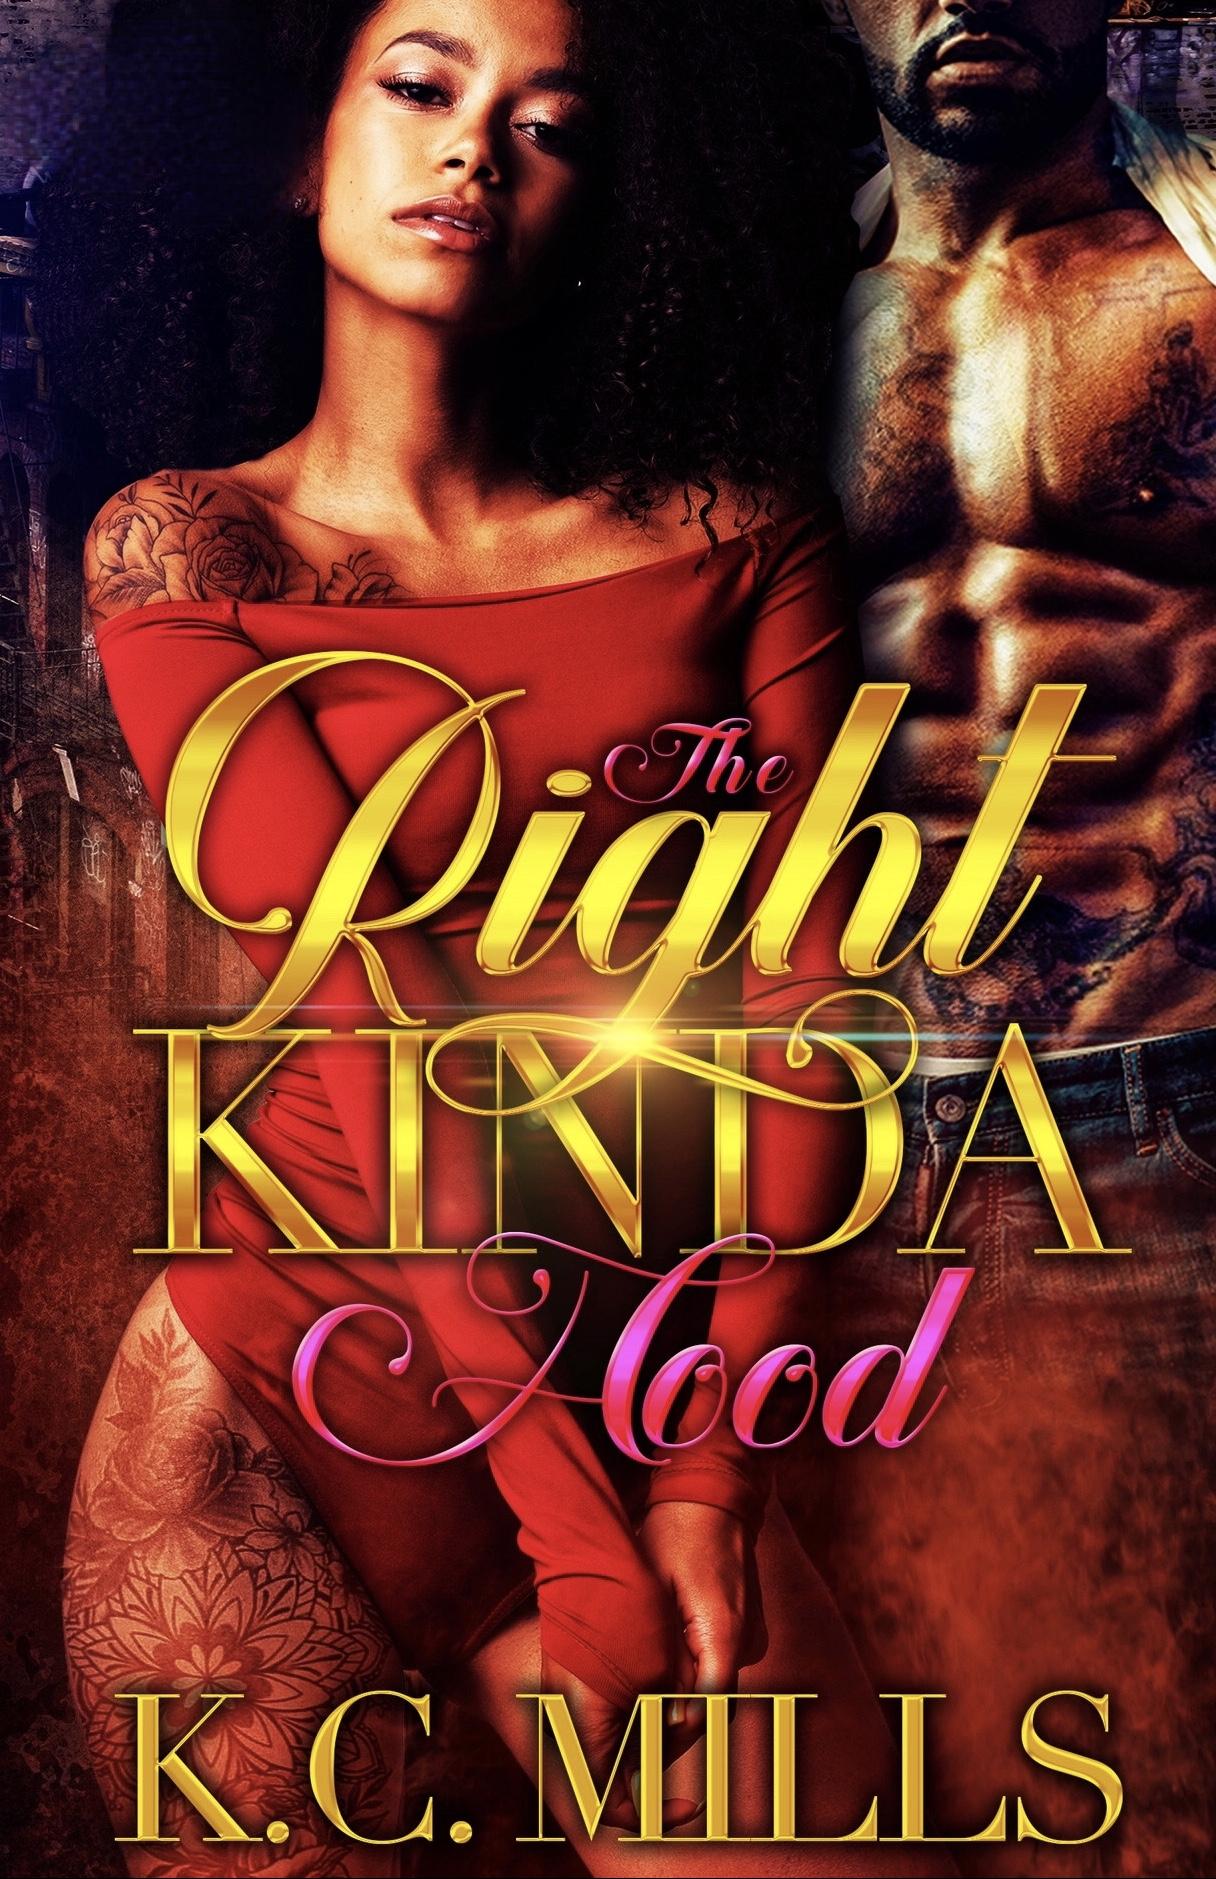 The Right Kinda Hood (book 1 & 2)